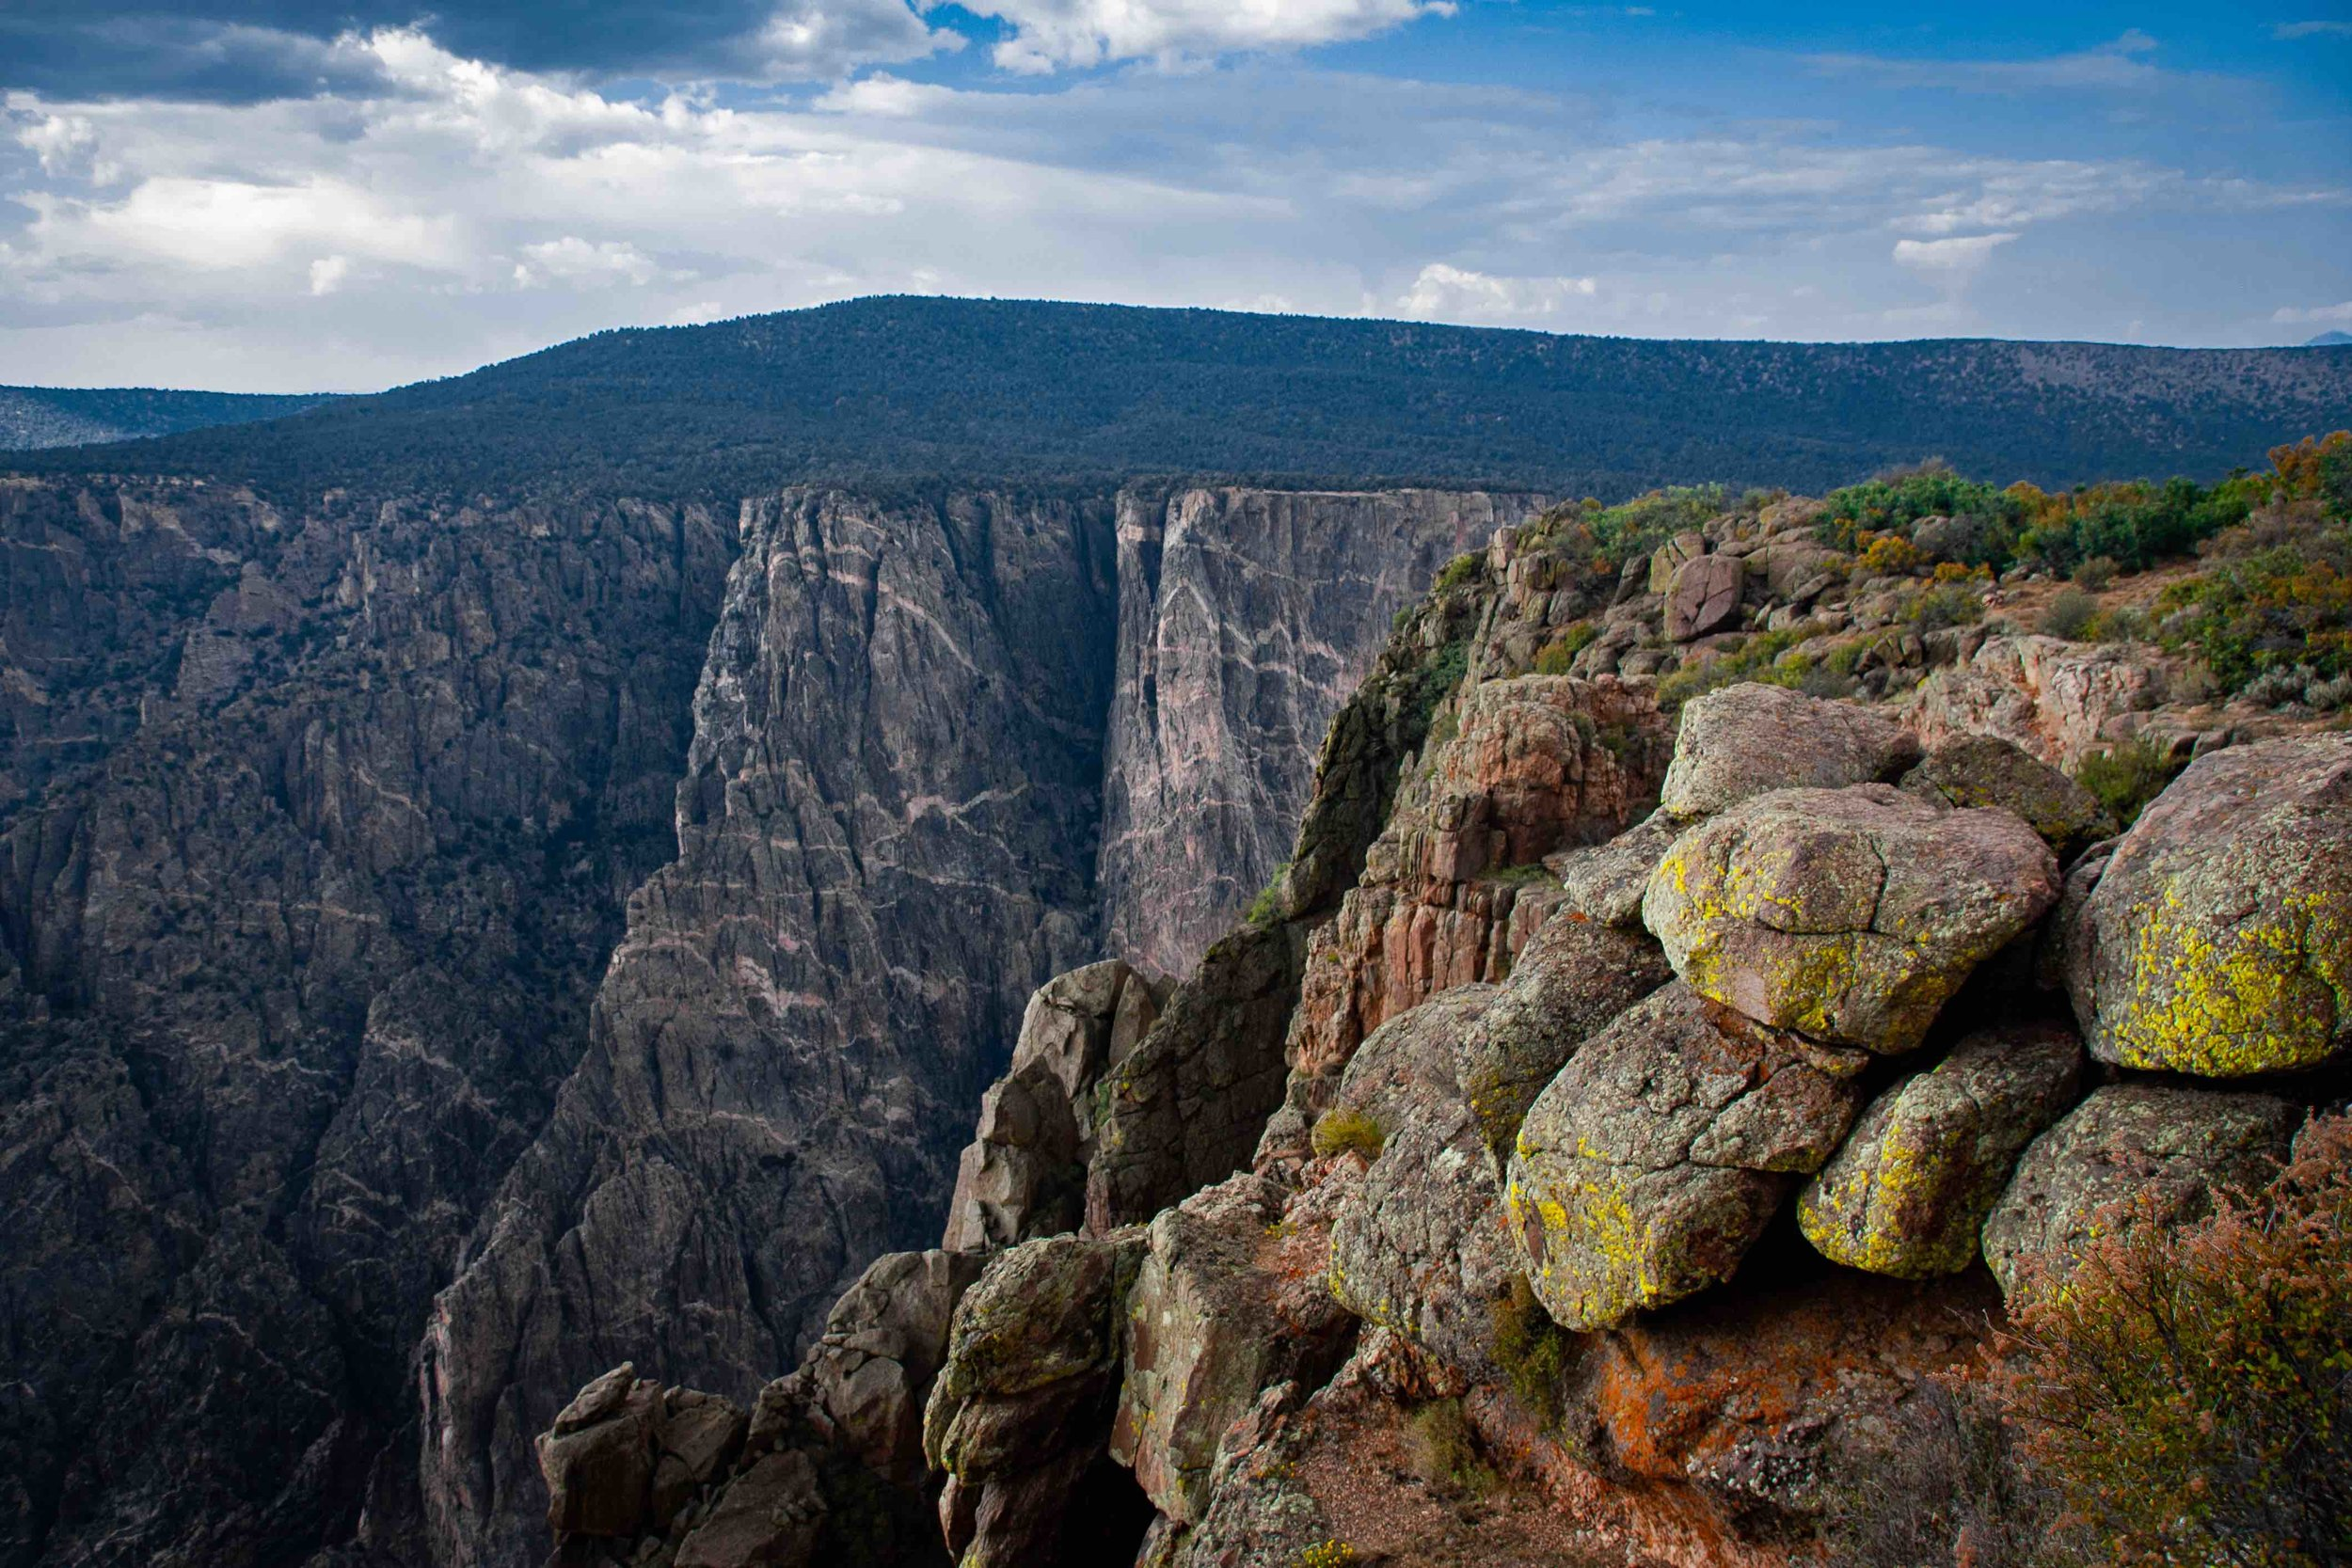 Gunnison Canyon